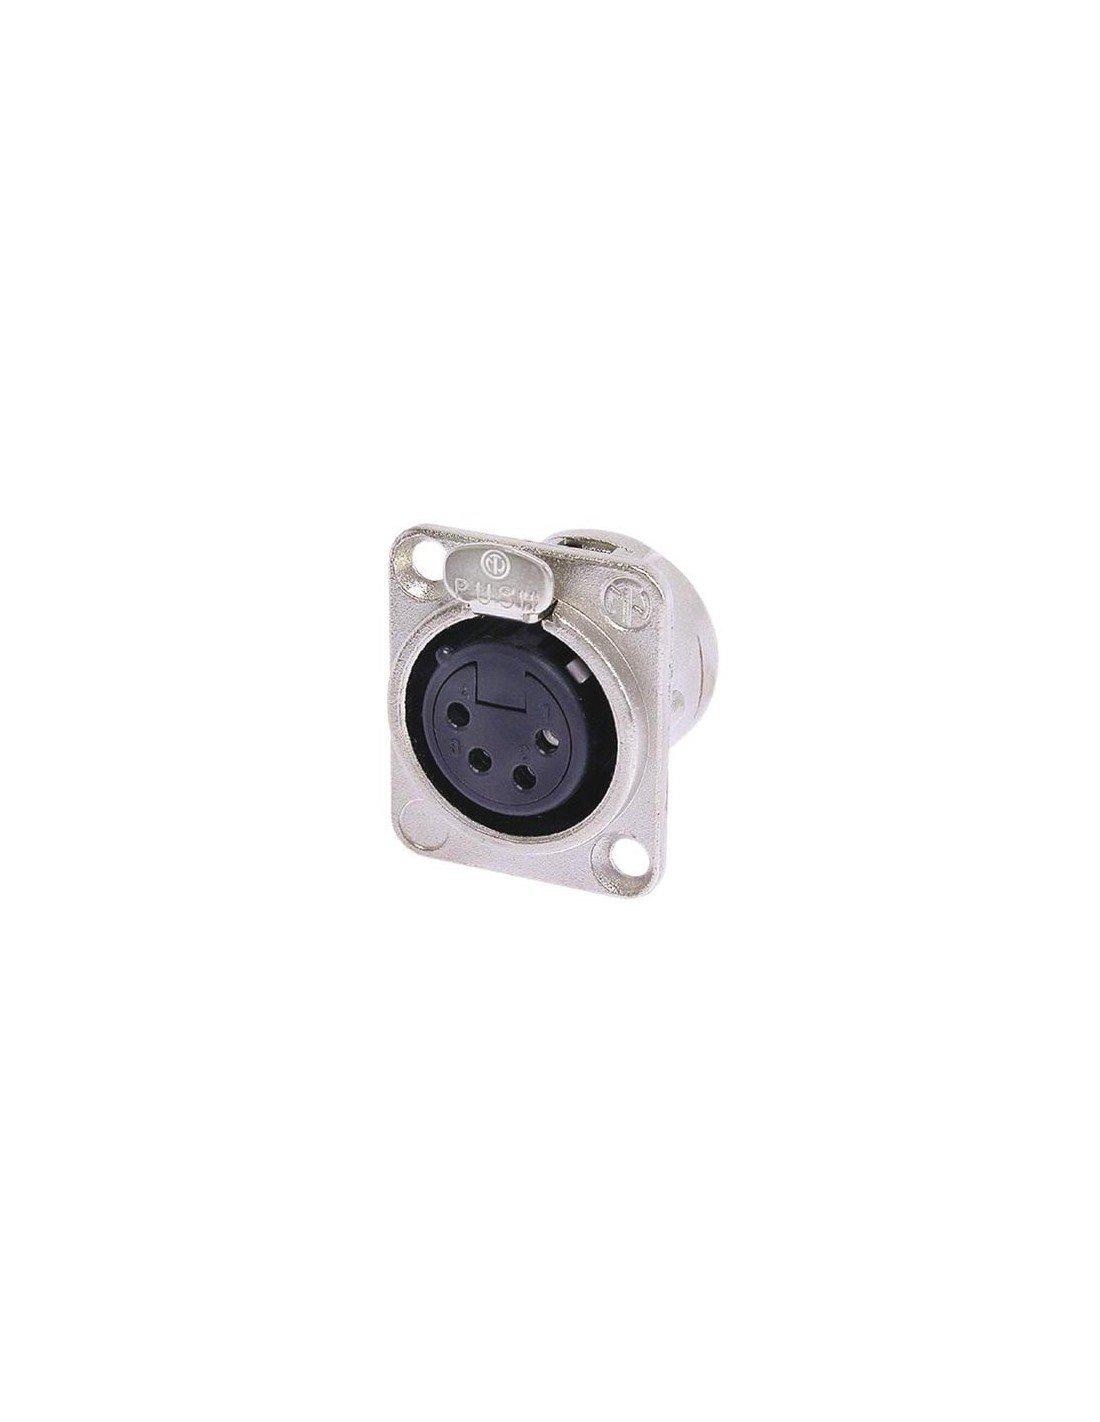 Neutrik 145105 Xlr Chassis Socket 4-Pin